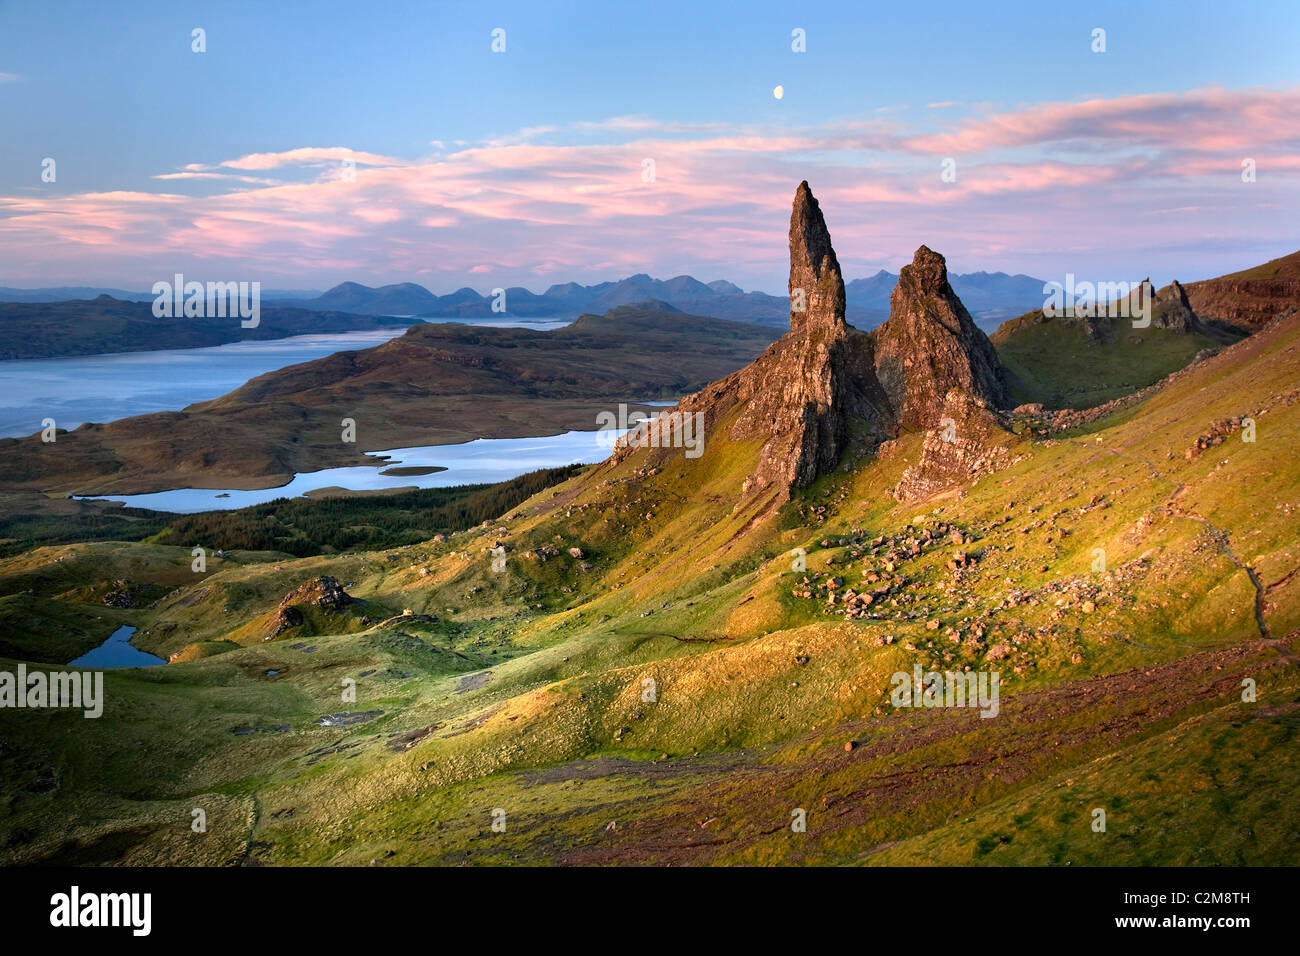 Viejo de Storr, Isla de Skye Imagen De Stock